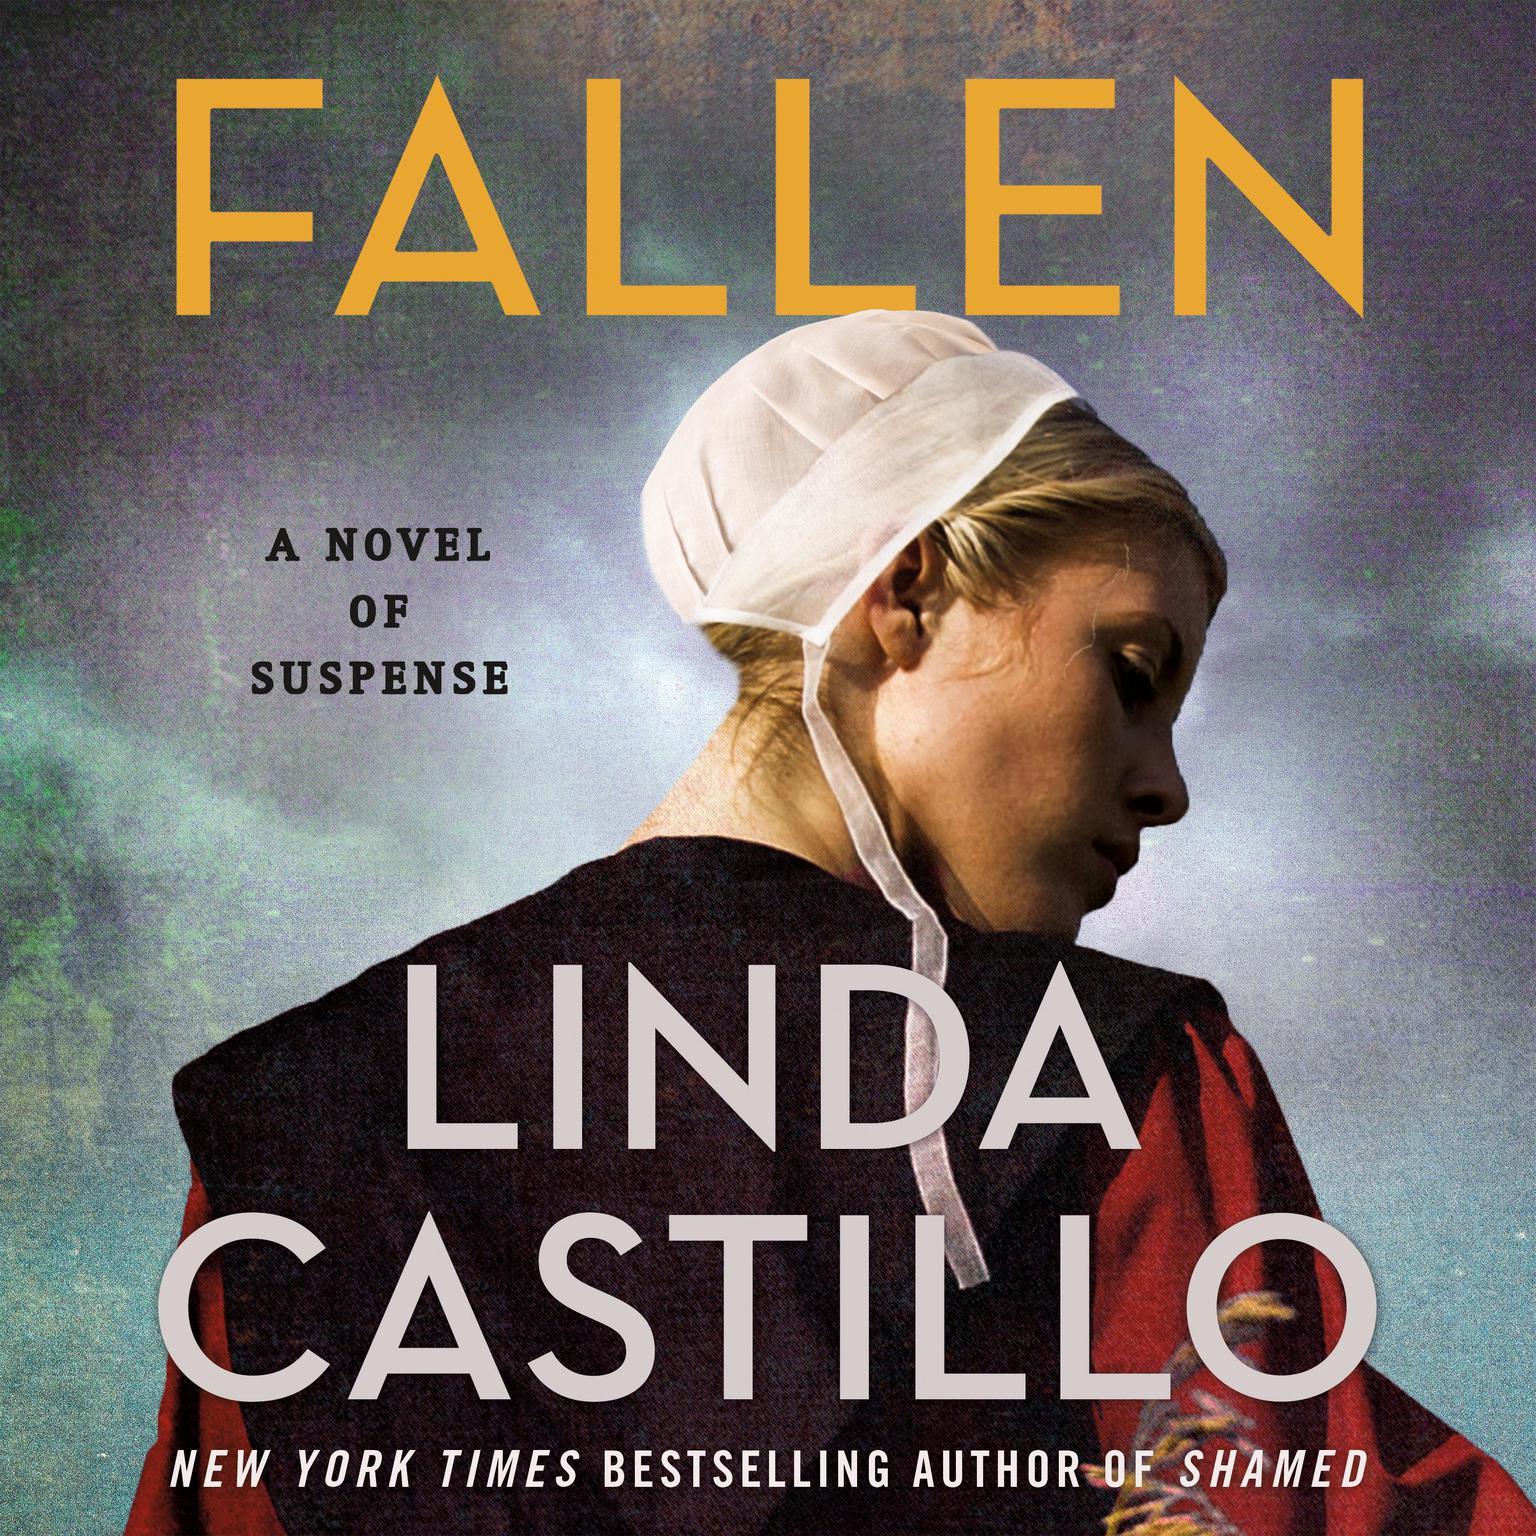 Fallen: A Novel of Suspense Audiobook, by Linda Castillo